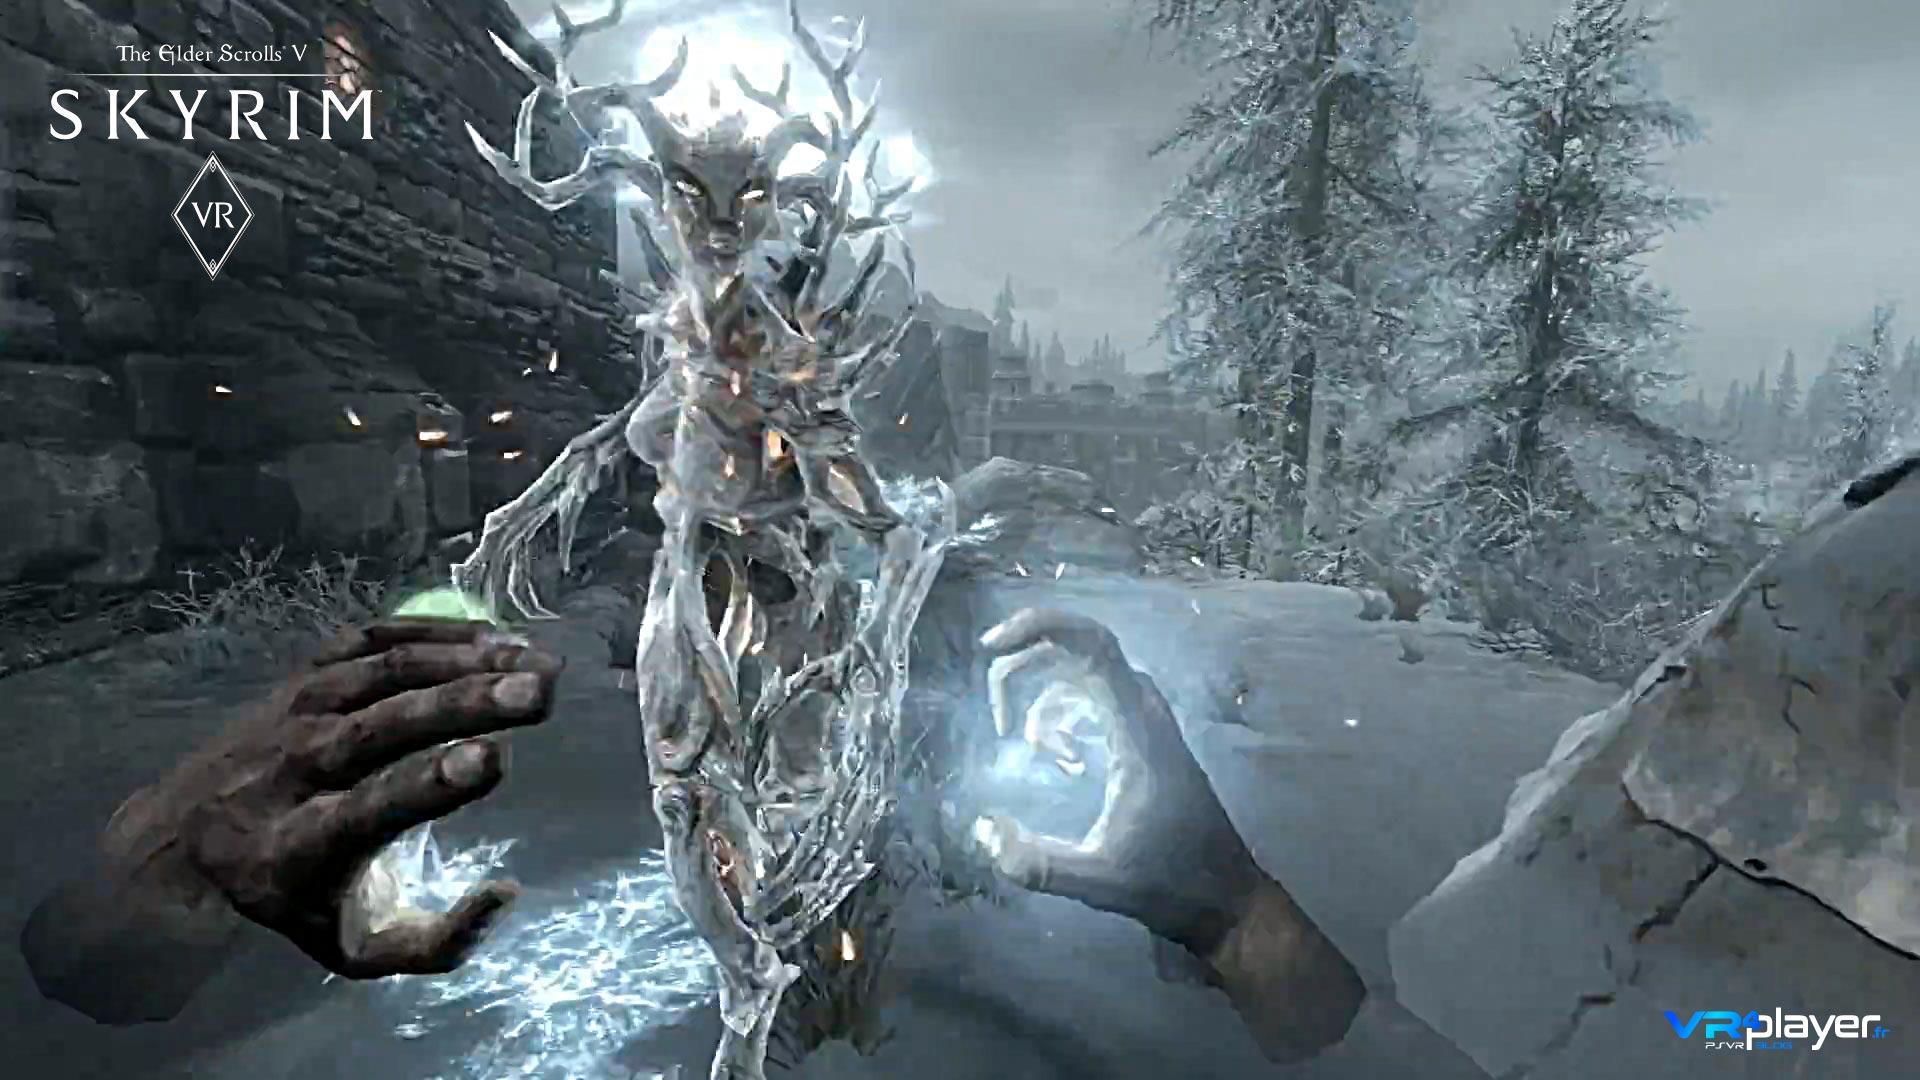 Skyrim VR sur Playstation VR